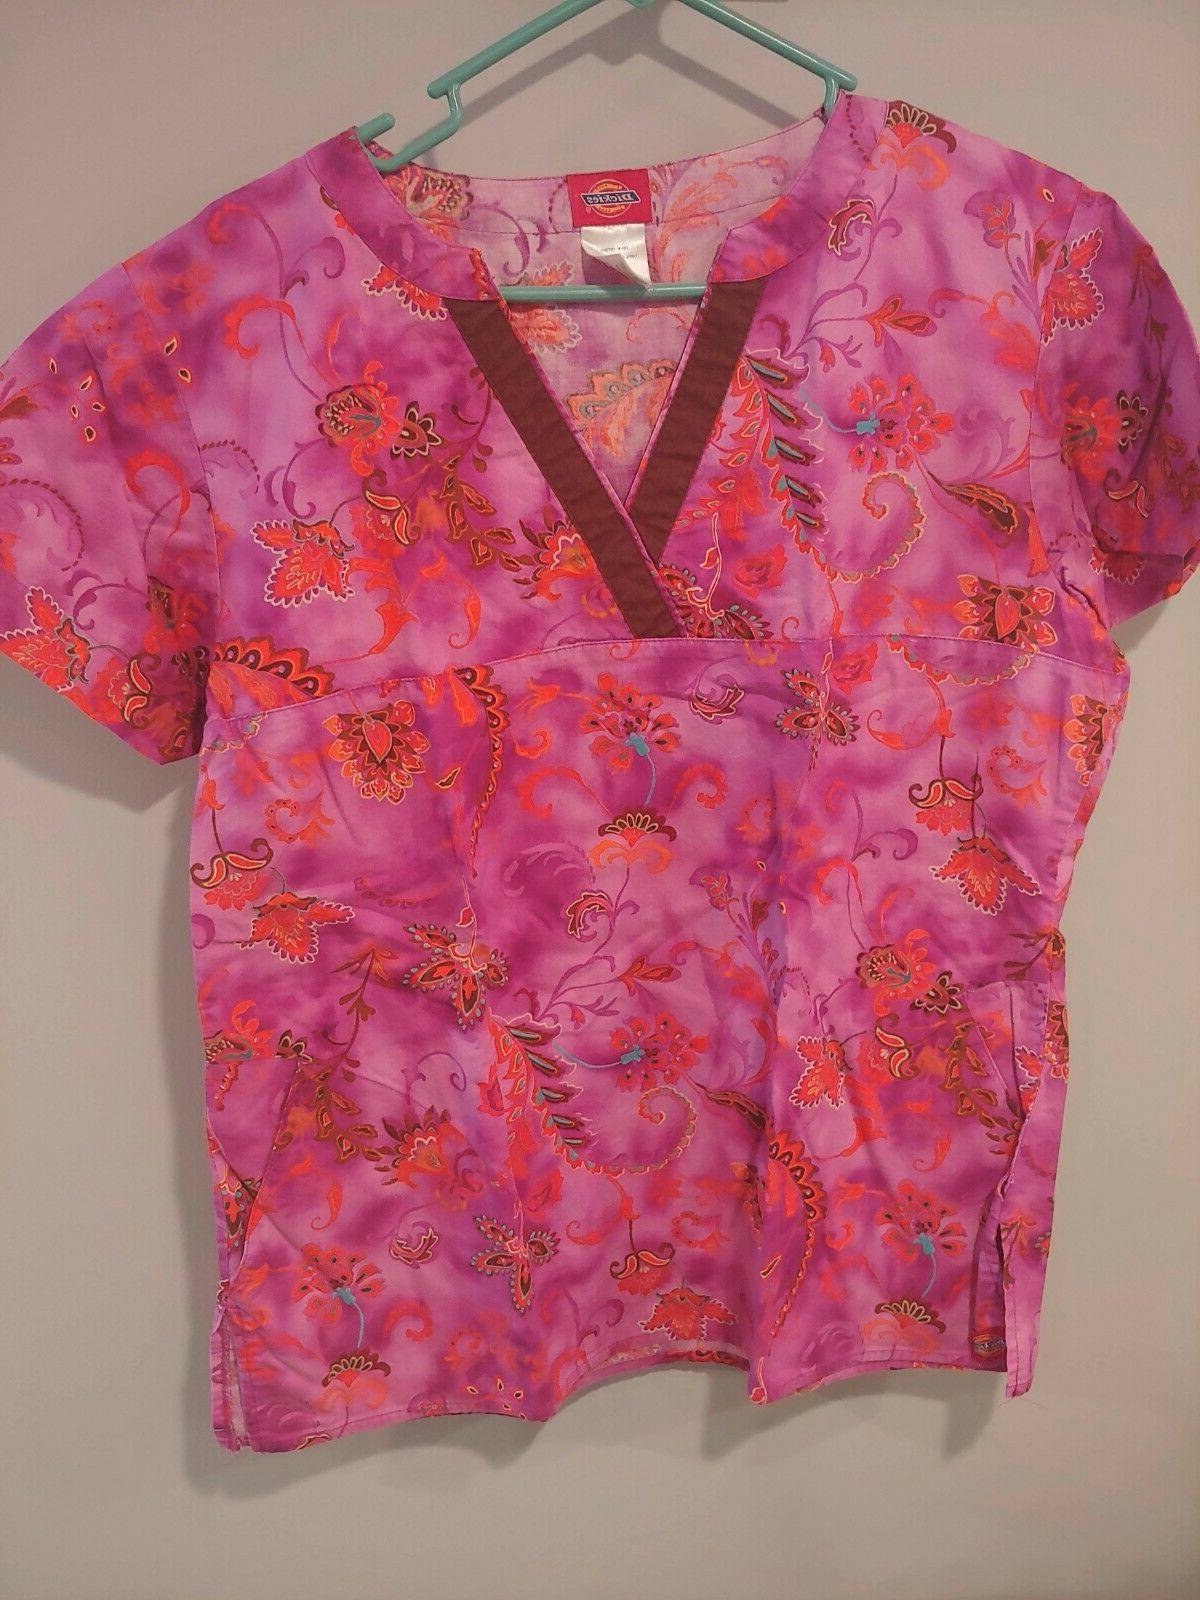 uniforms scrub top short sleeve floral print